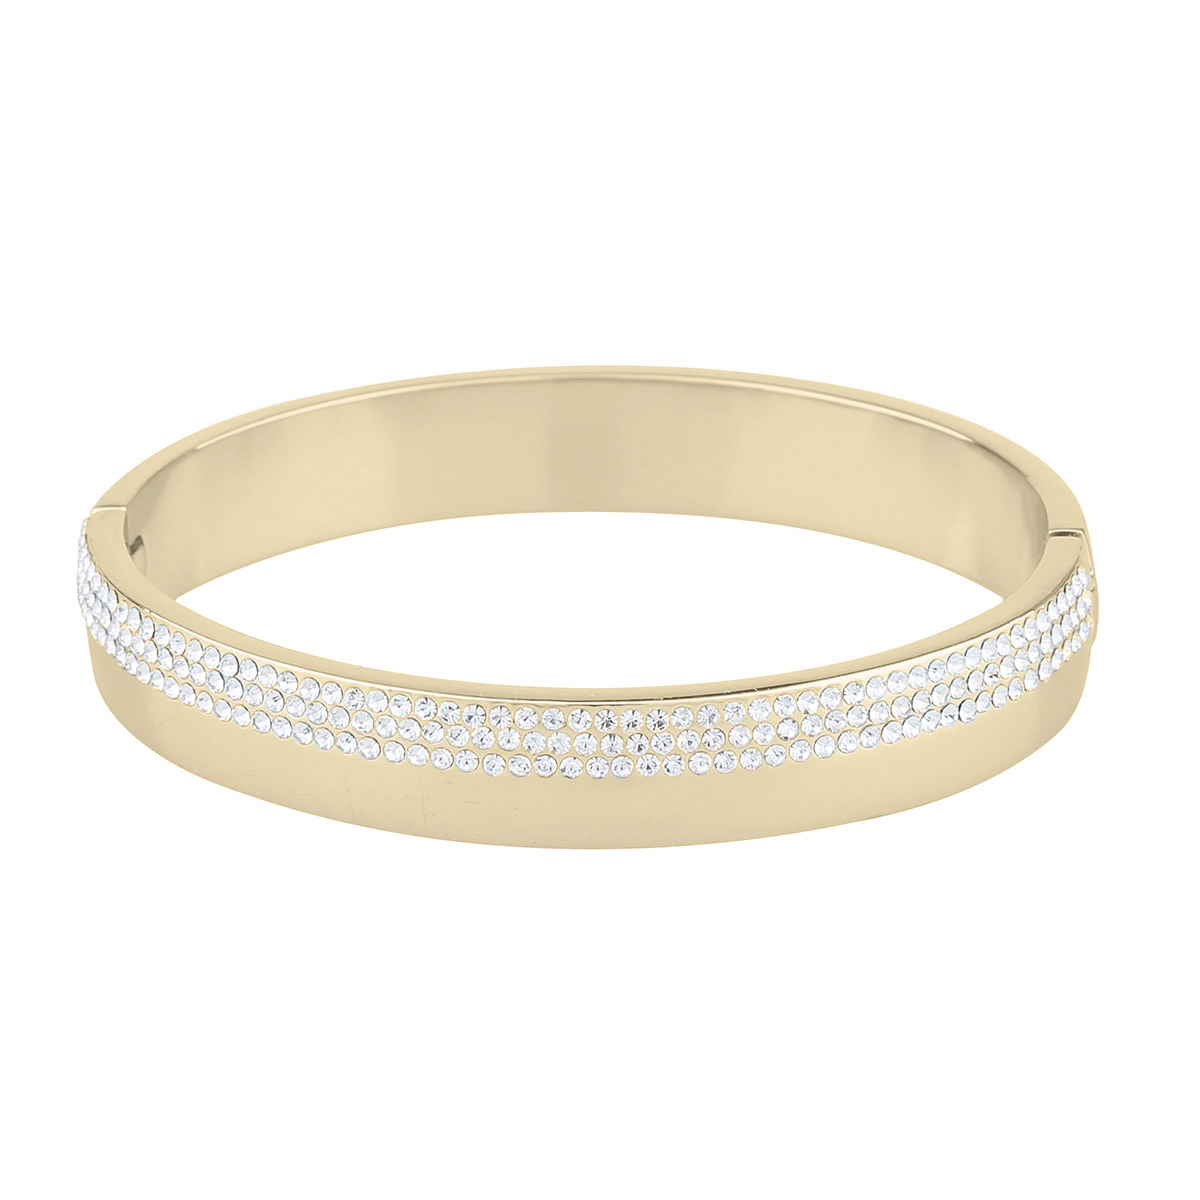 Snö of Sweden - Marseille oval armband, guld/kristall